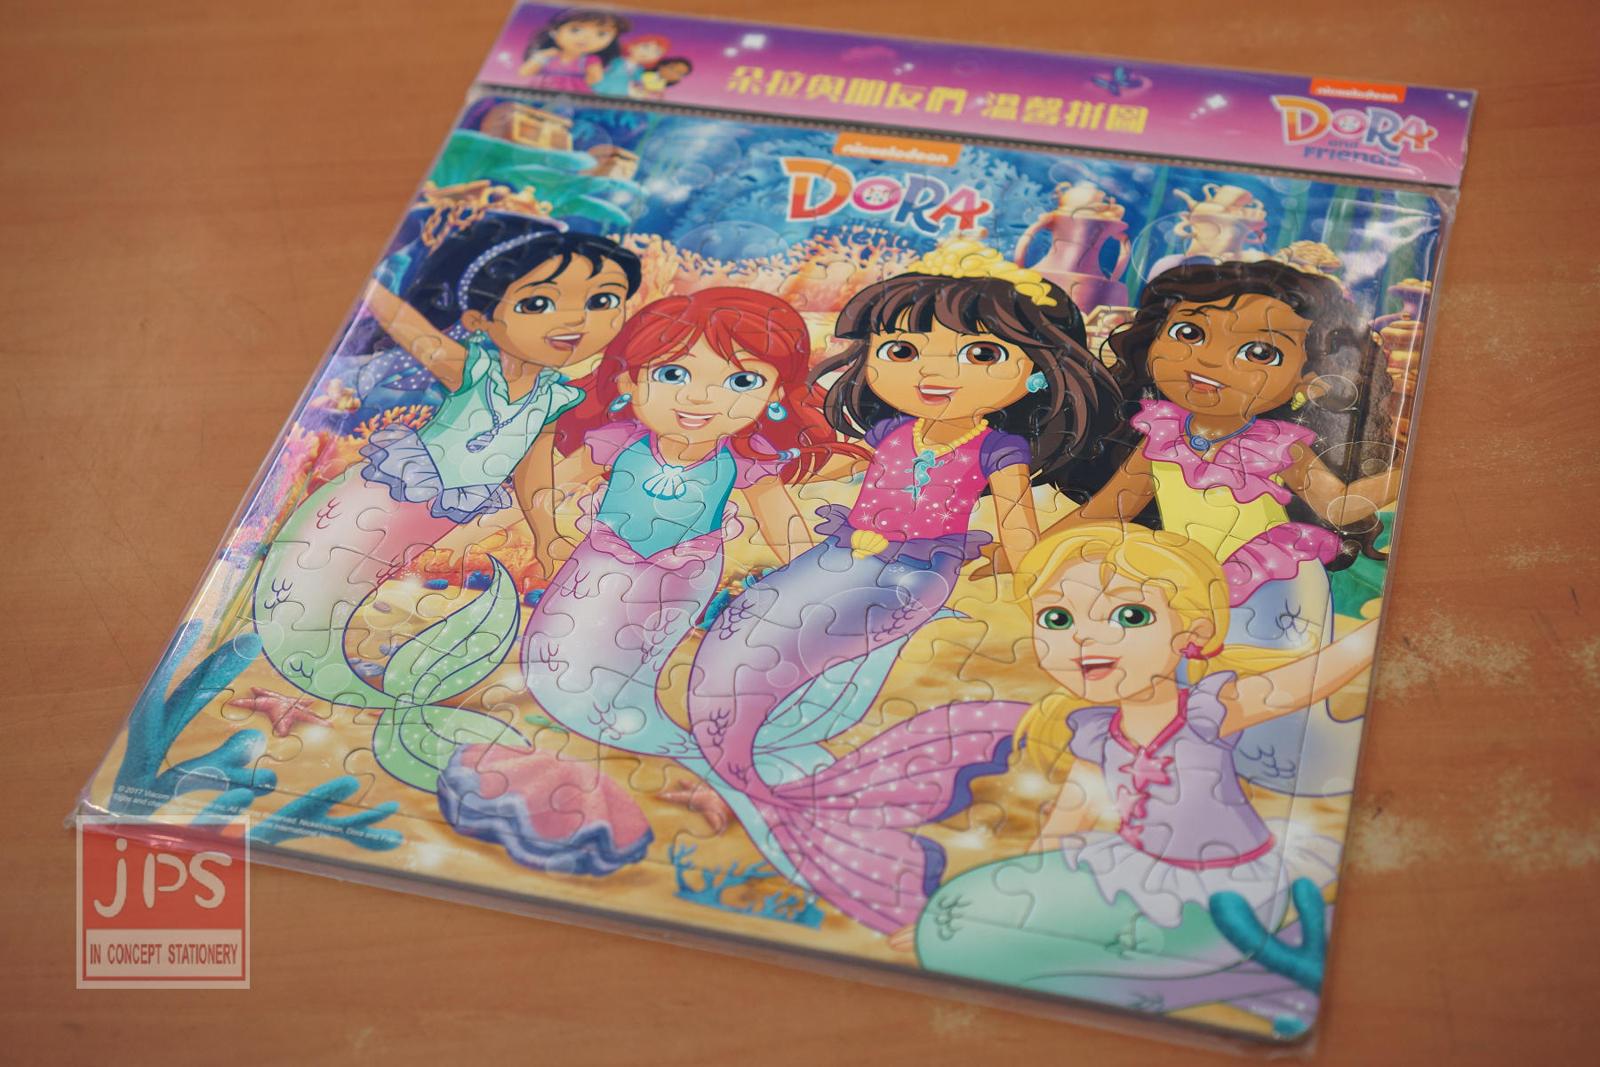 DORA 朵拉與朋友們 溫馨拼圖 100片 人魚